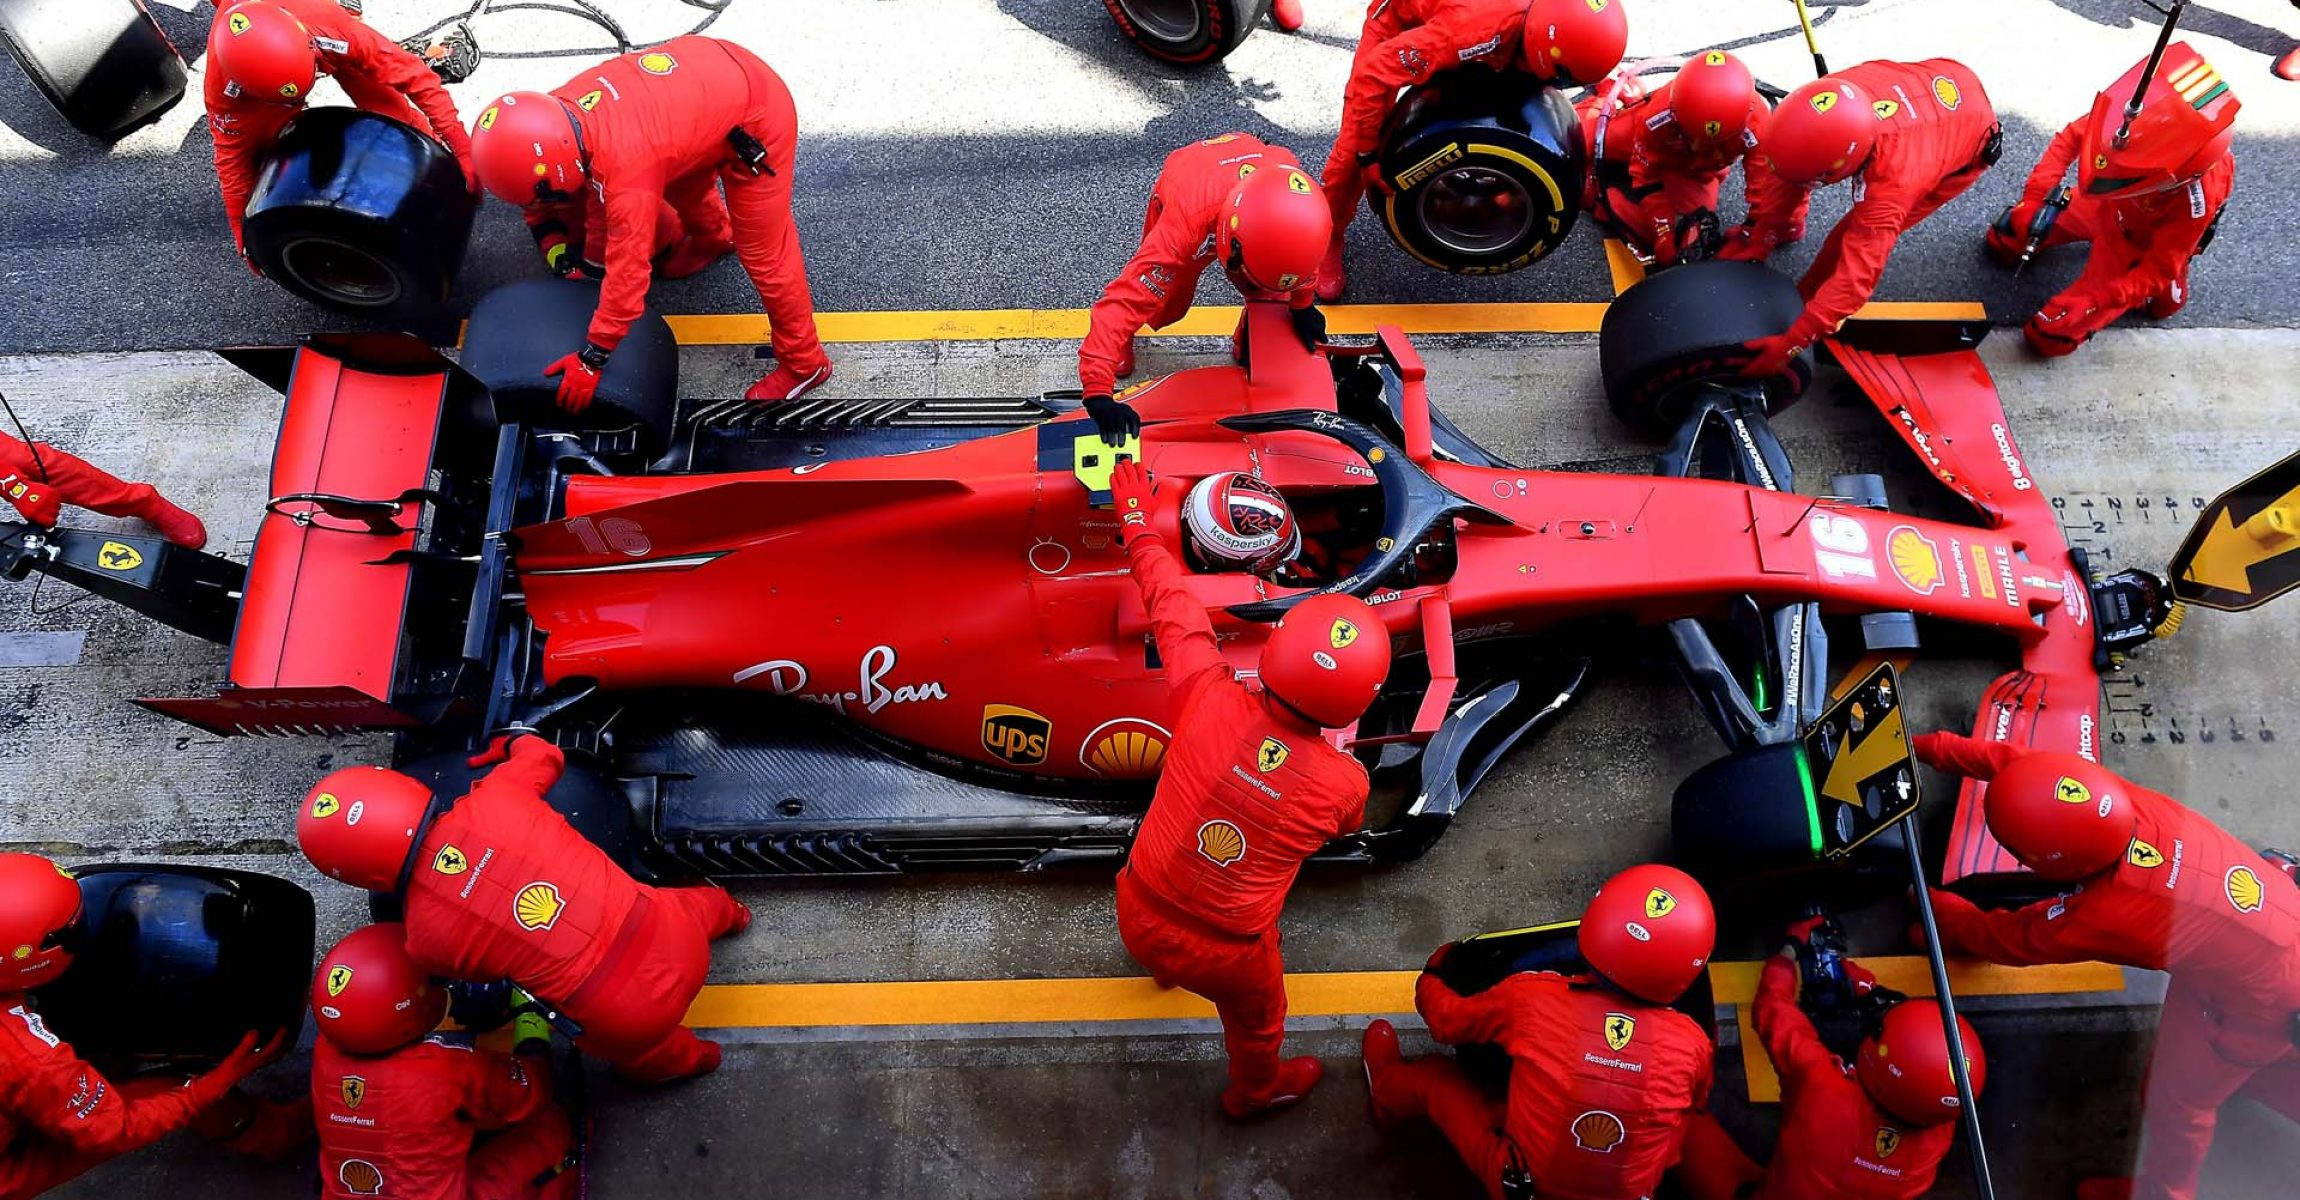 GP SPAGNA F1/2020 -  DOMENICA 16/08/2020   credit: @Scuderia Ferrari Press Office Charles Leclerc Ferrari